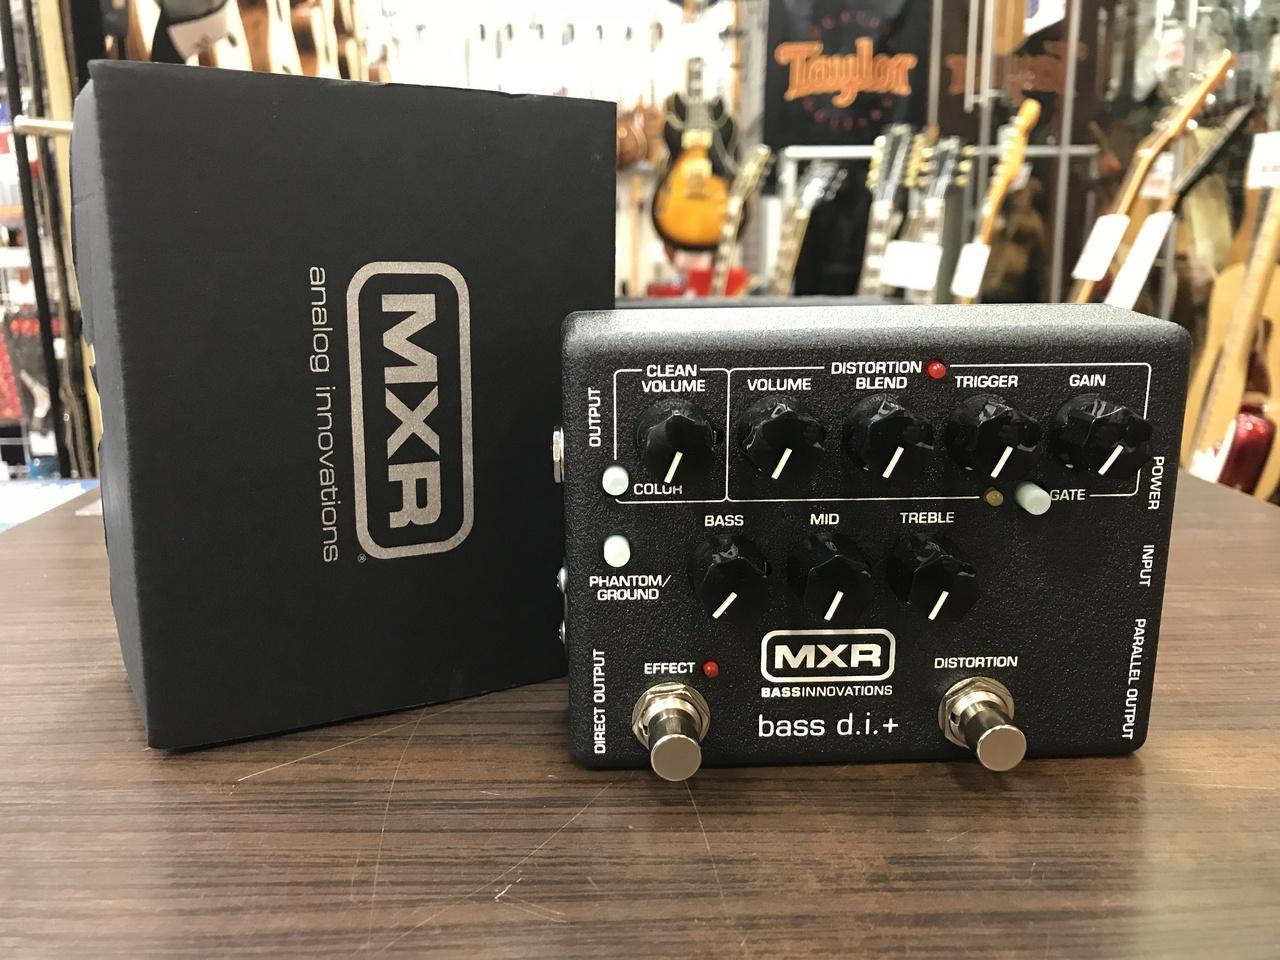 MXR M80 Bass DI + Outlet Specials] [bass preamp / DI]